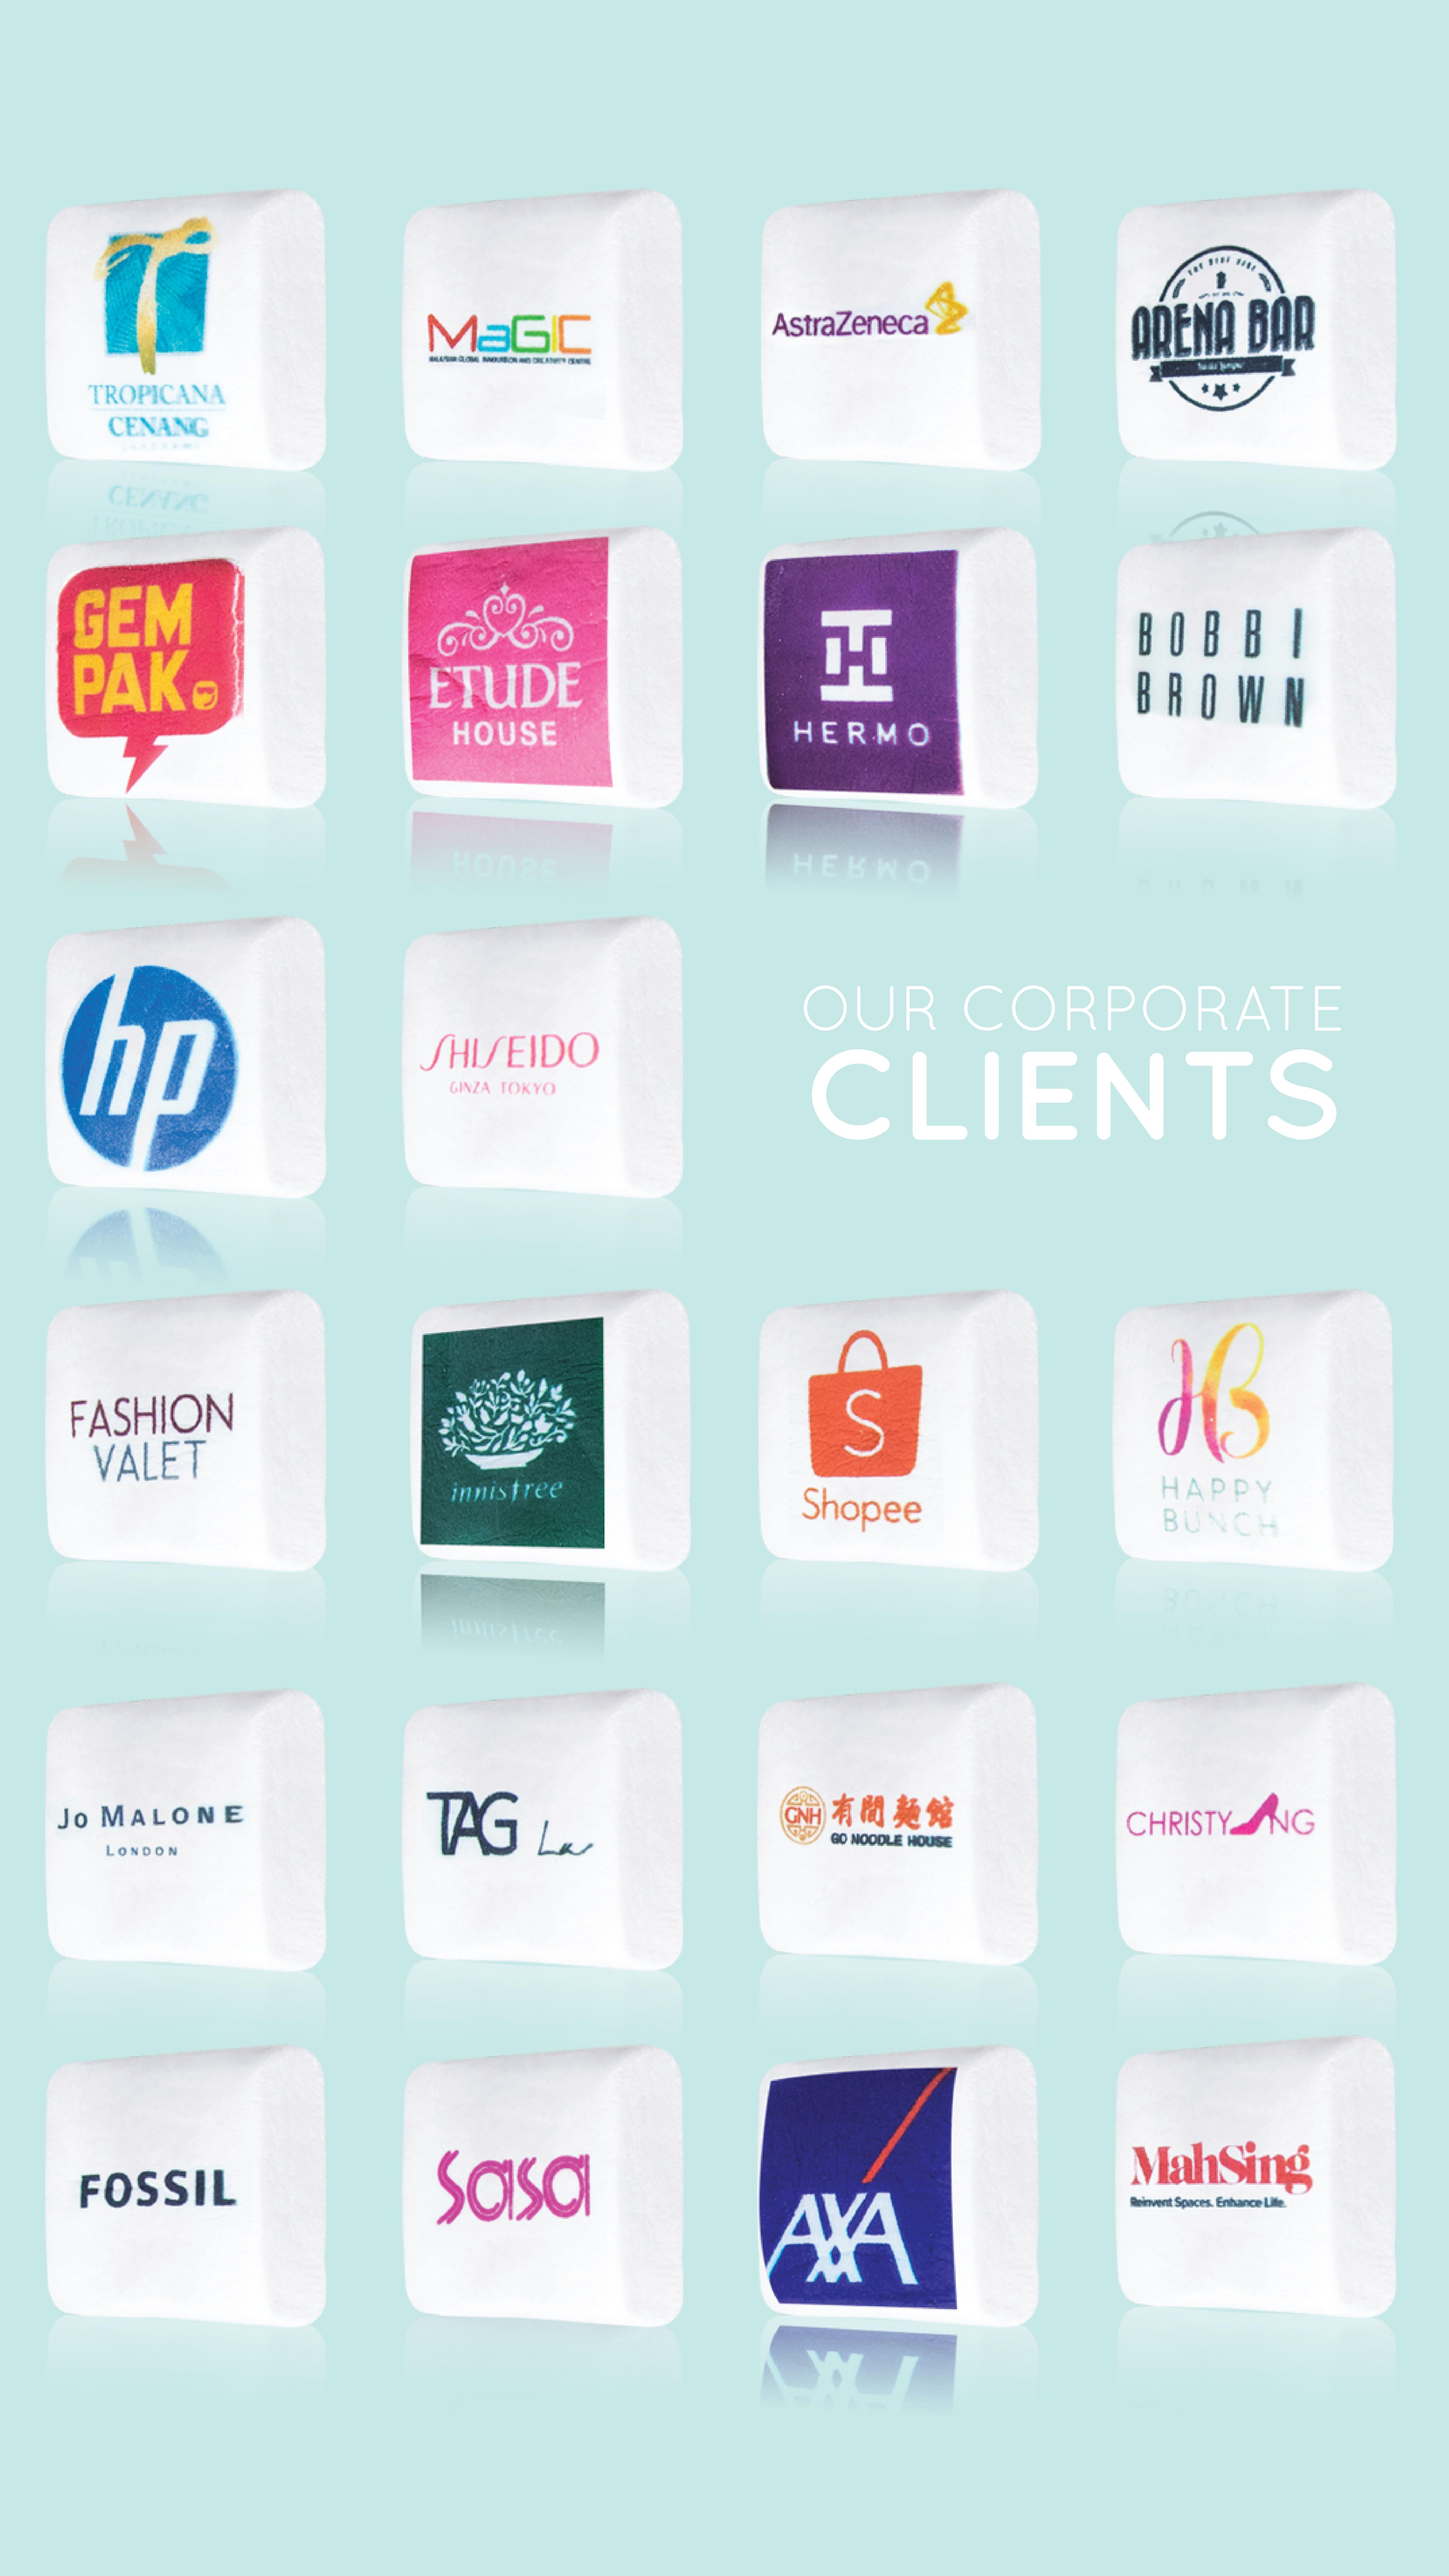 Corporate client 01 1